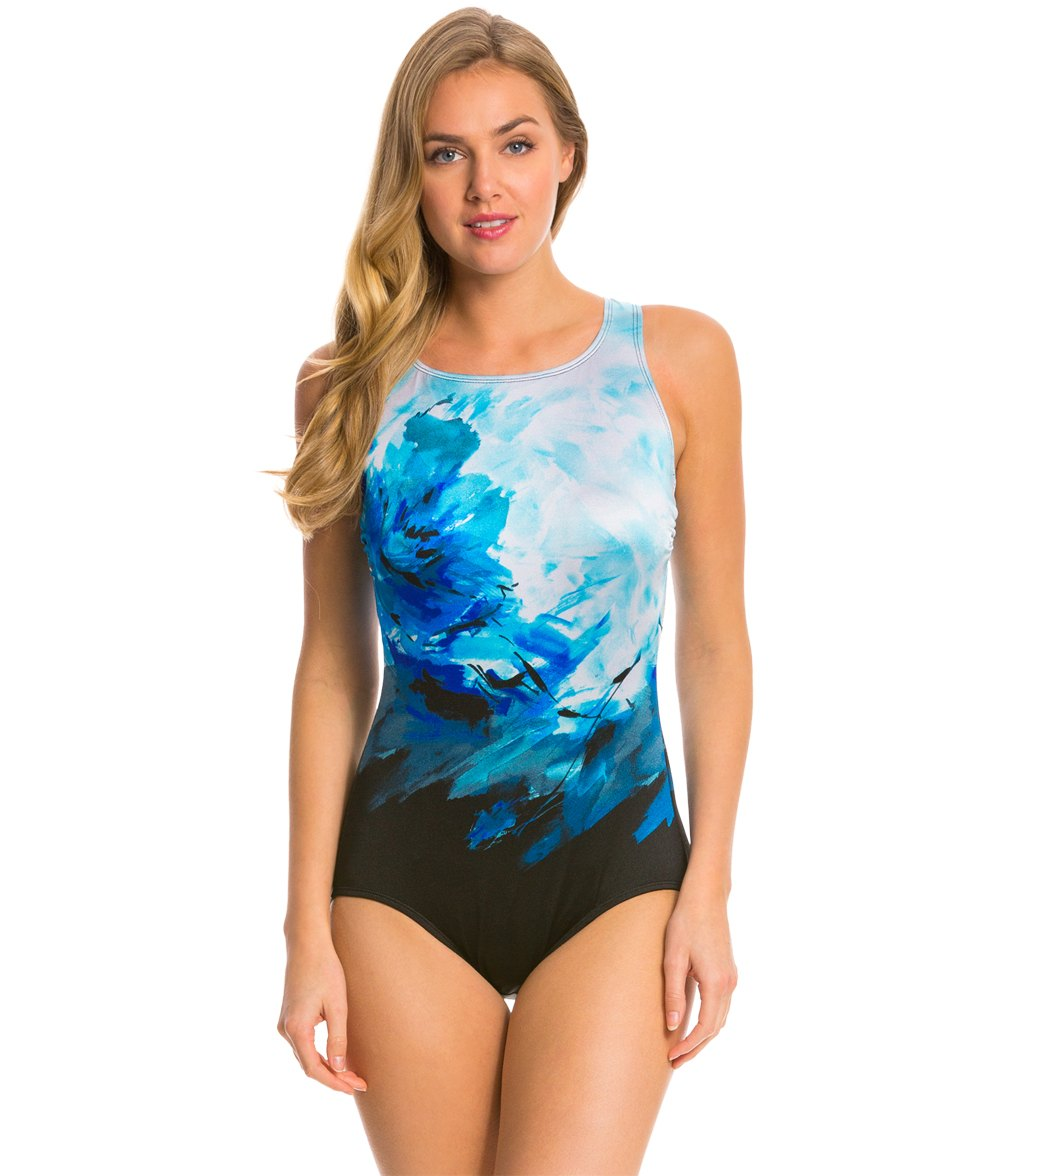 b21ae000a6621 Longitude rosalinda high neck one piece swimsuit at free shipping jpg  1044x1176 Longitude high neck swimsuits